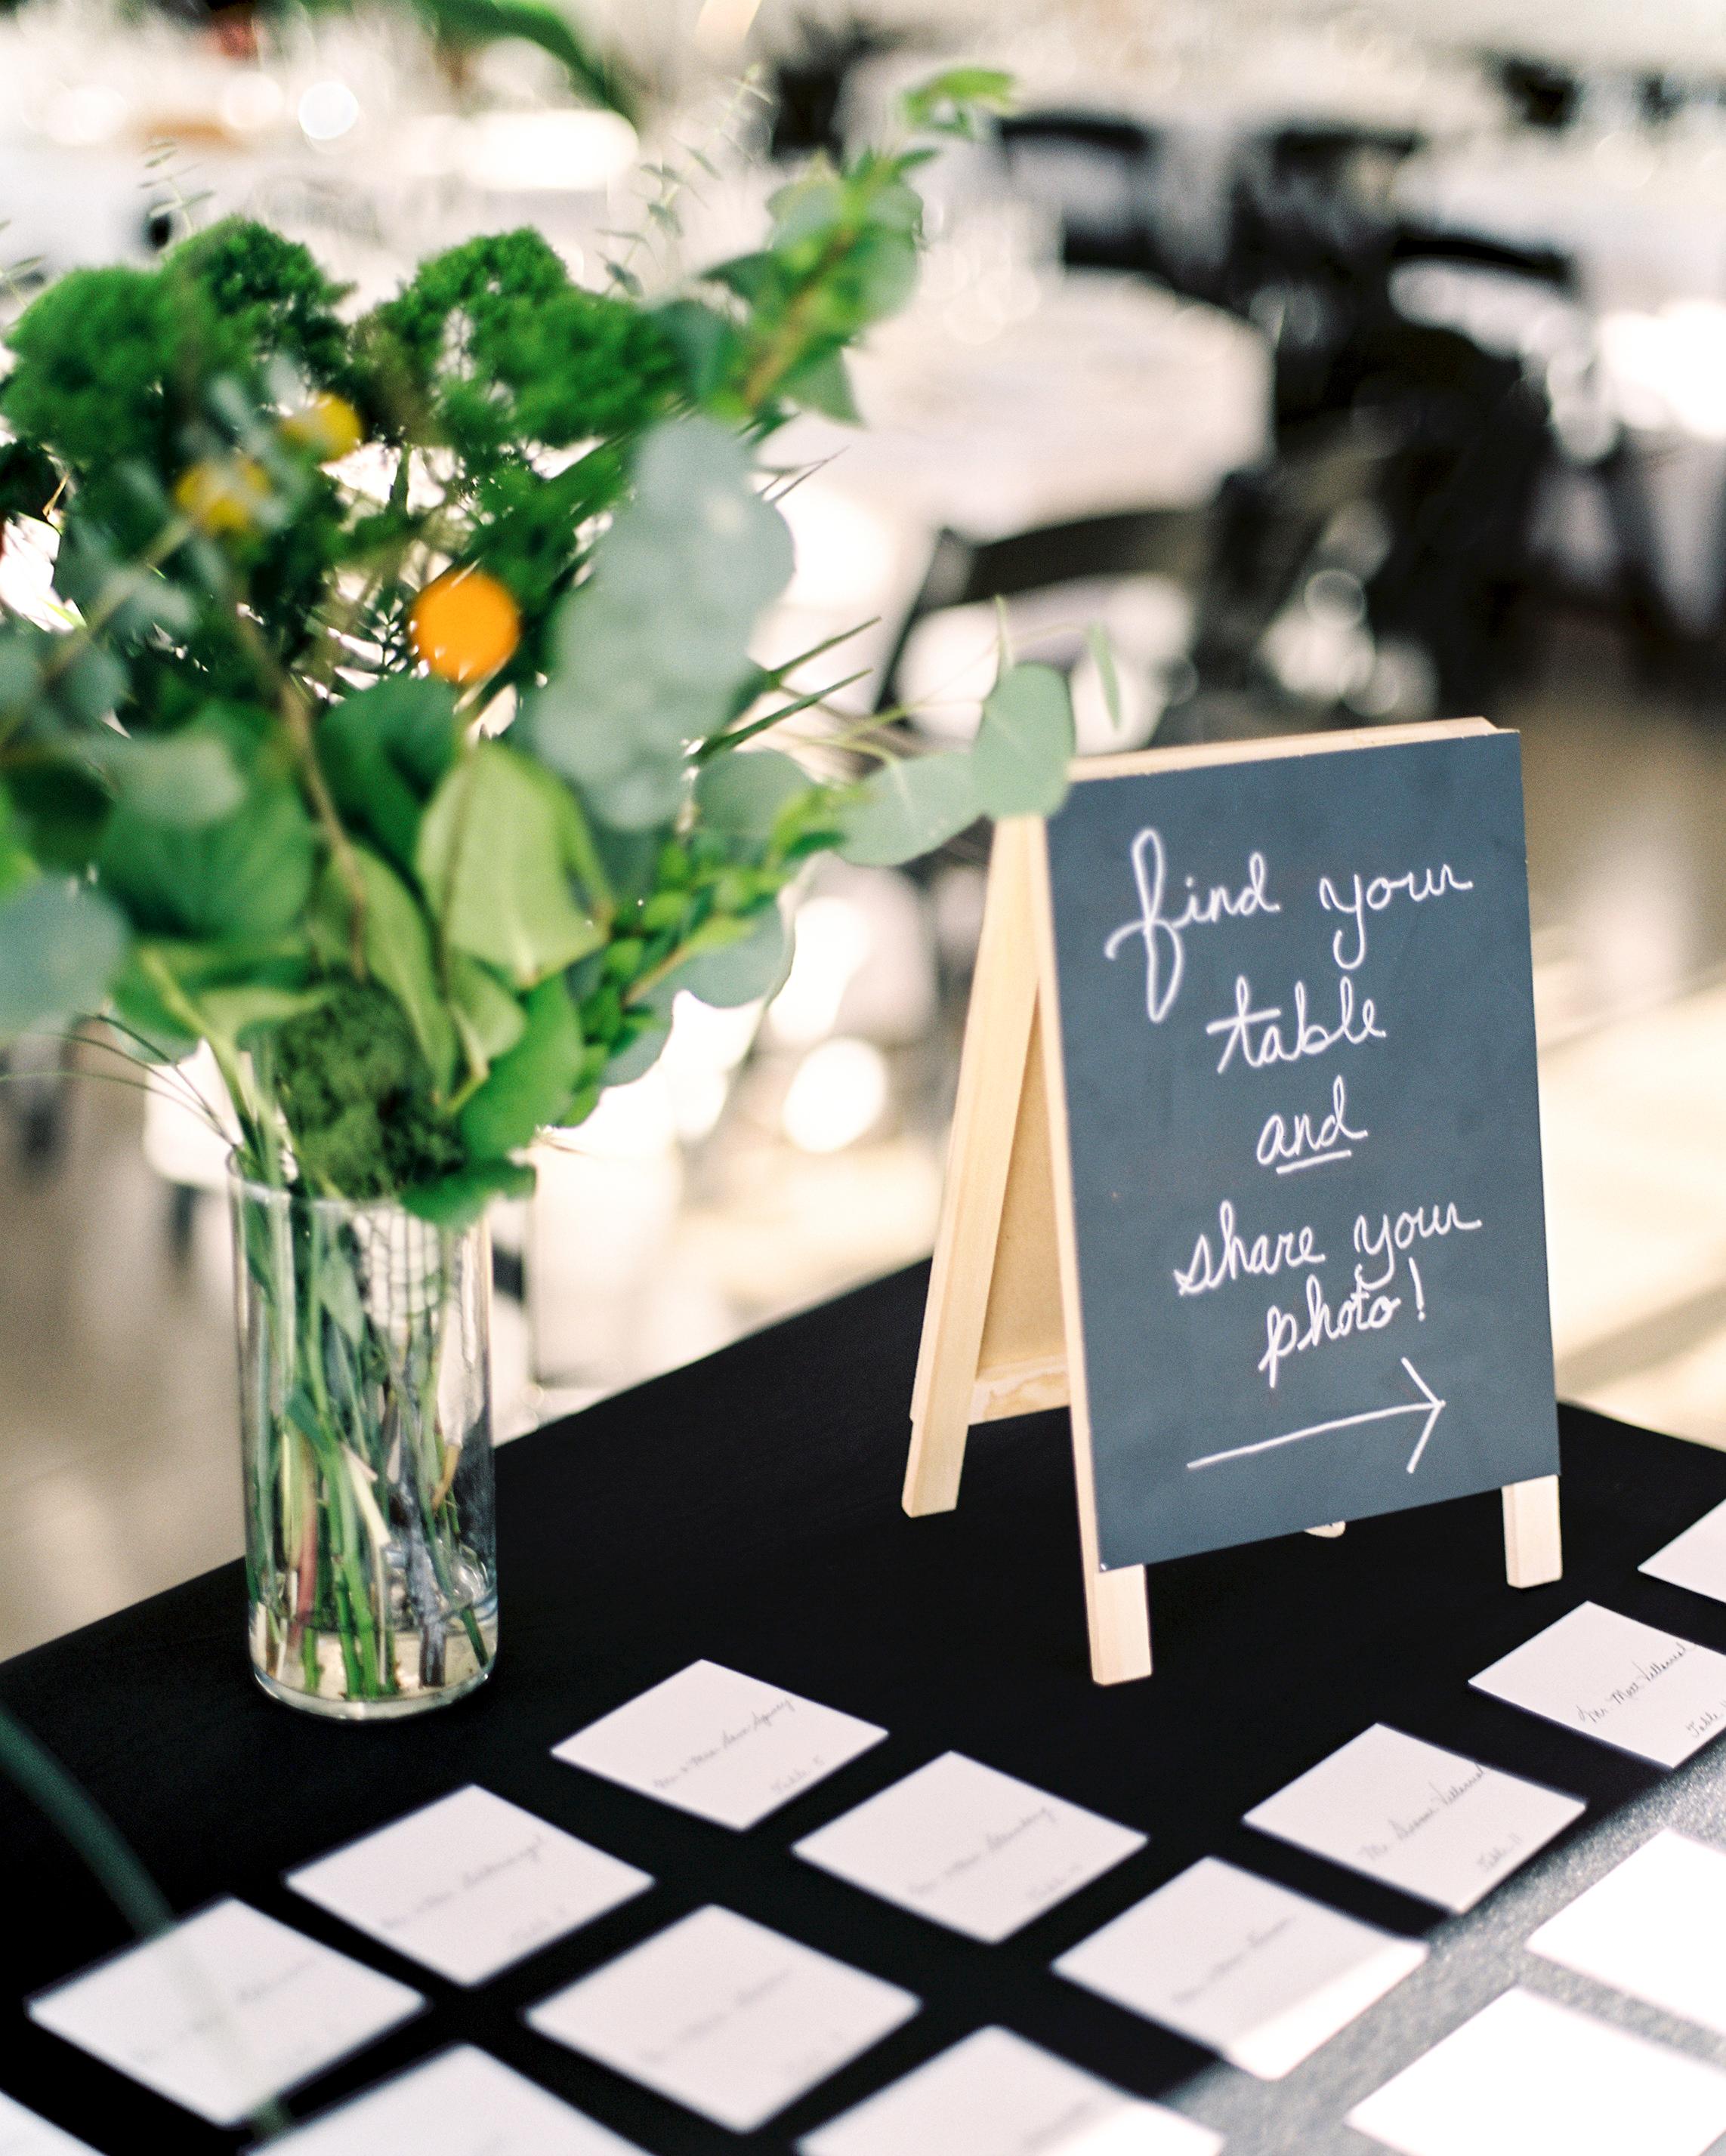 sydney-mike-wedding-escortcards-76-s111778-0215.jpg